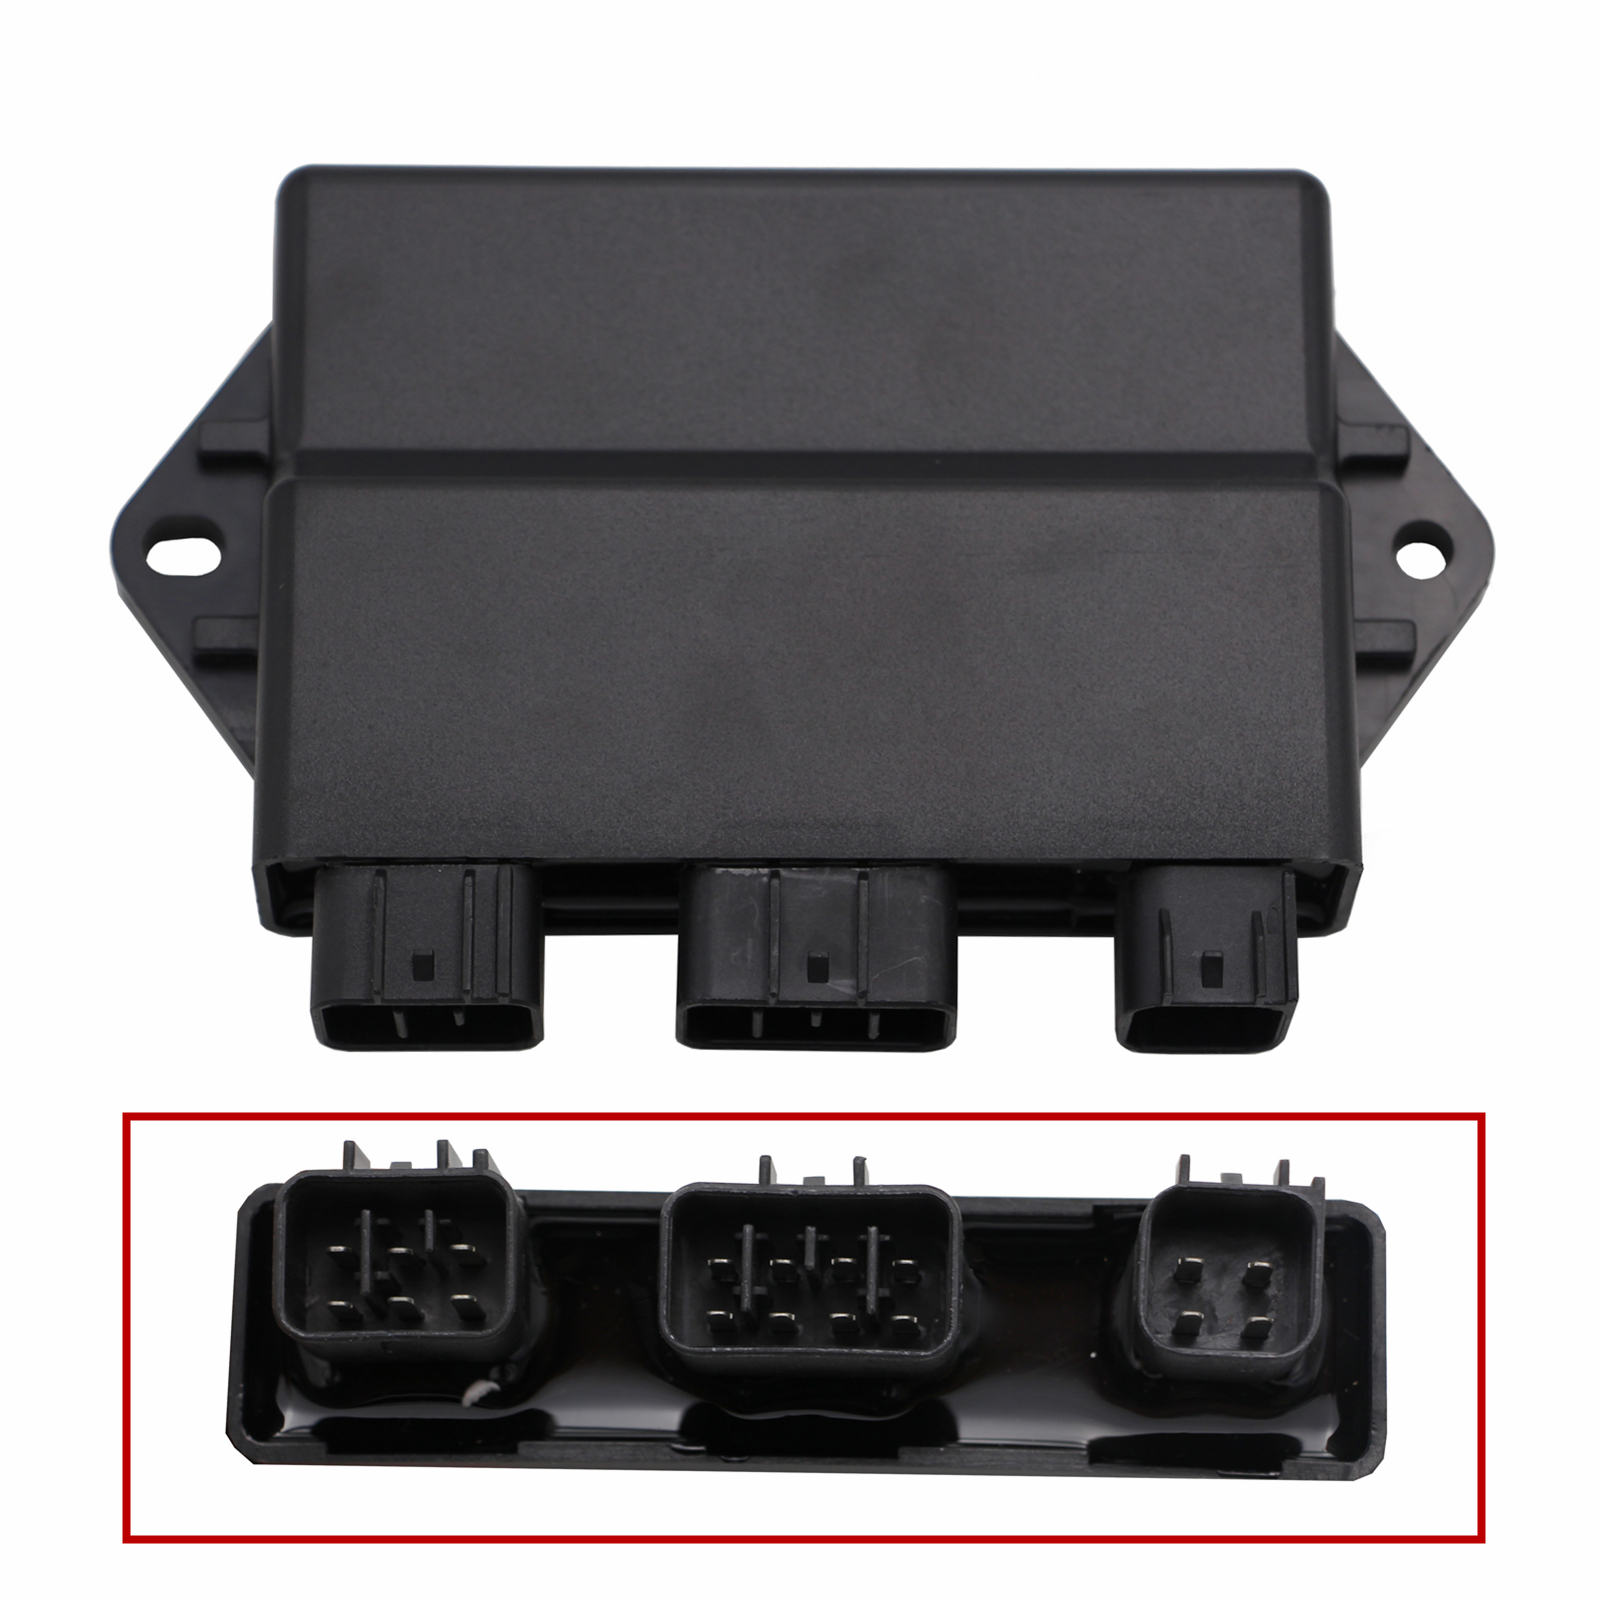 For Yamaha Grizzly Kodiak 450 CDI Igniter Ignition Module 5ND-85540-10-00